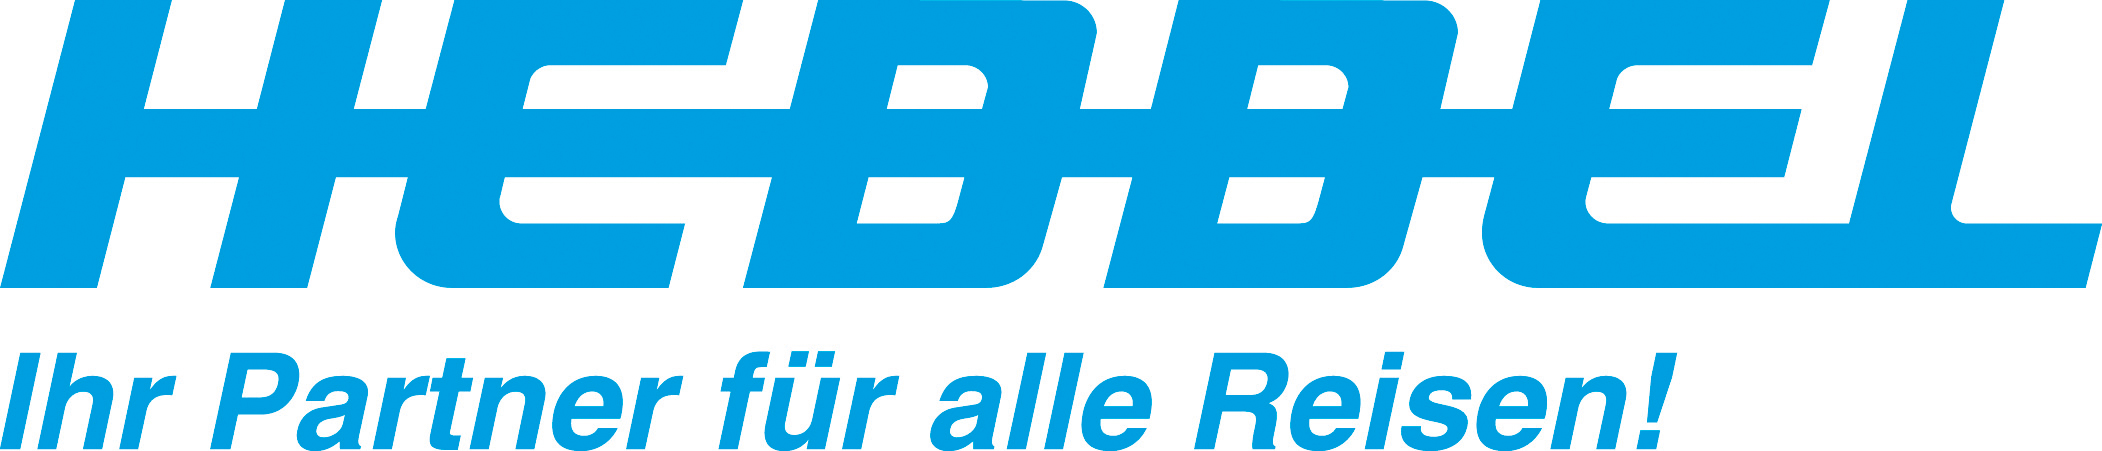 Reisebüro Hebbel Leverkusen-Wiesdorf